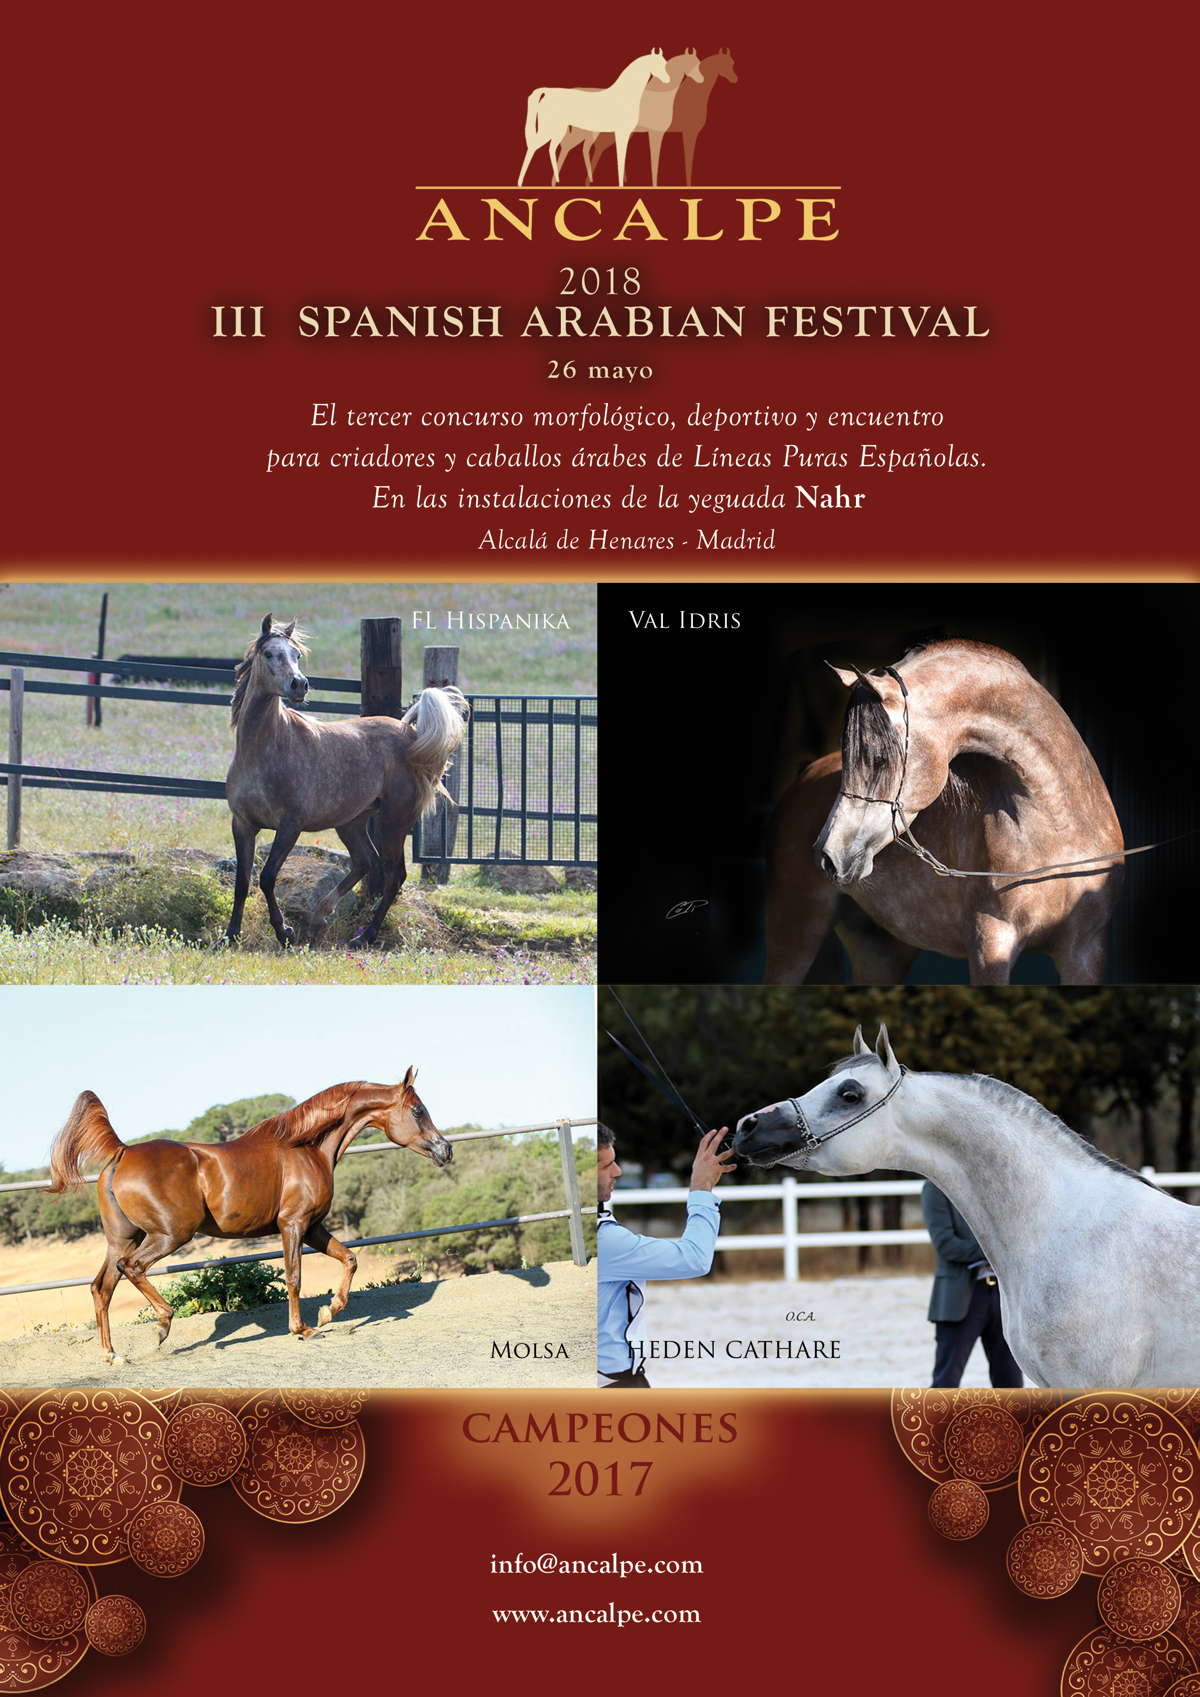 spanish arabian festival alcala henares